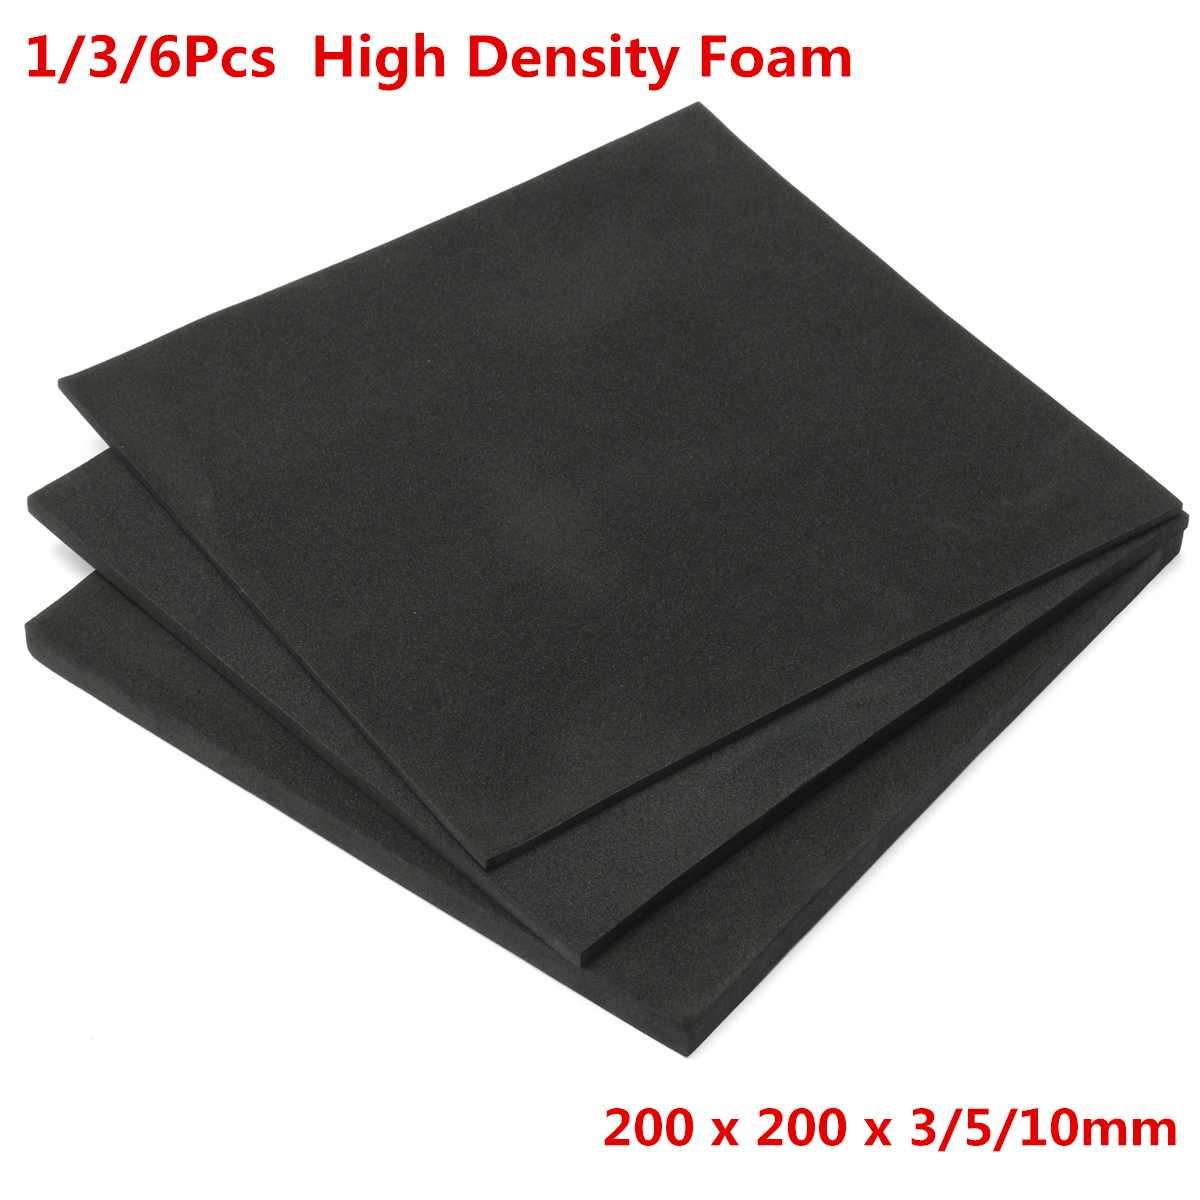 200x200mm ESD Anti Static Pin Insertion High Density Foam 3/5/10mm